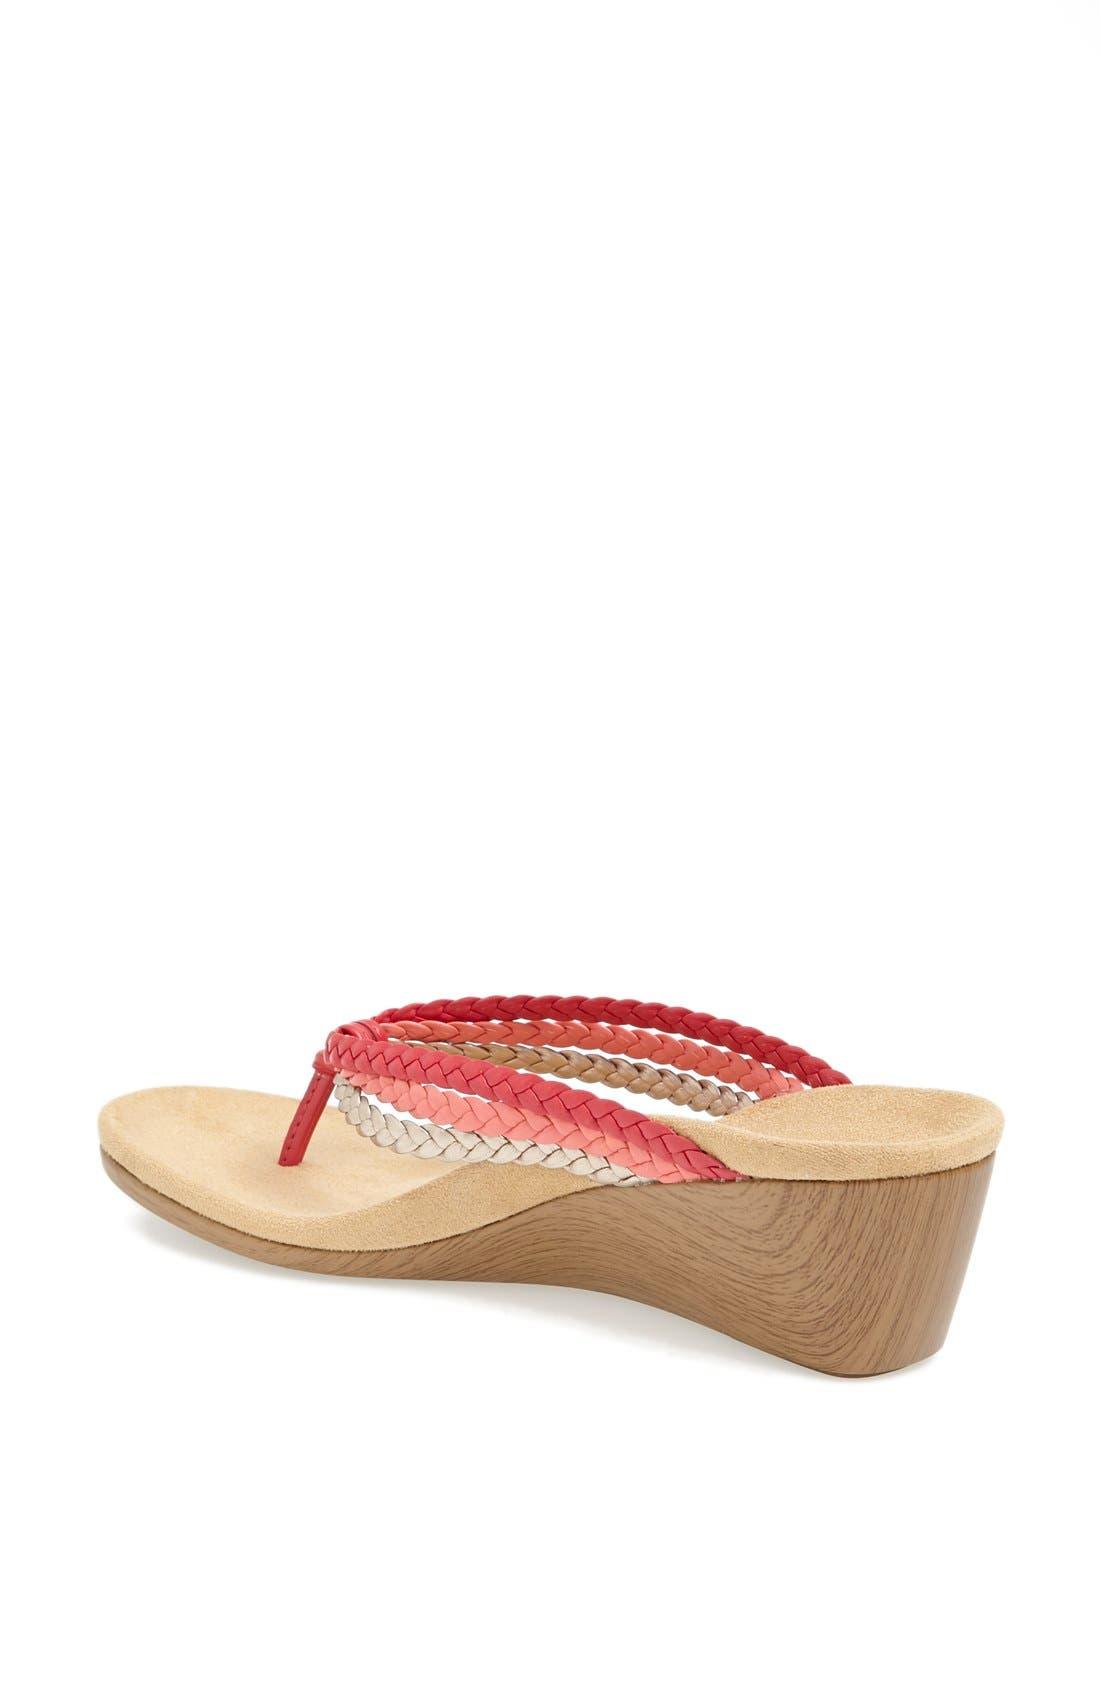 Alternate Image 2  - Vionic 'Ramba' Wedge Sandal